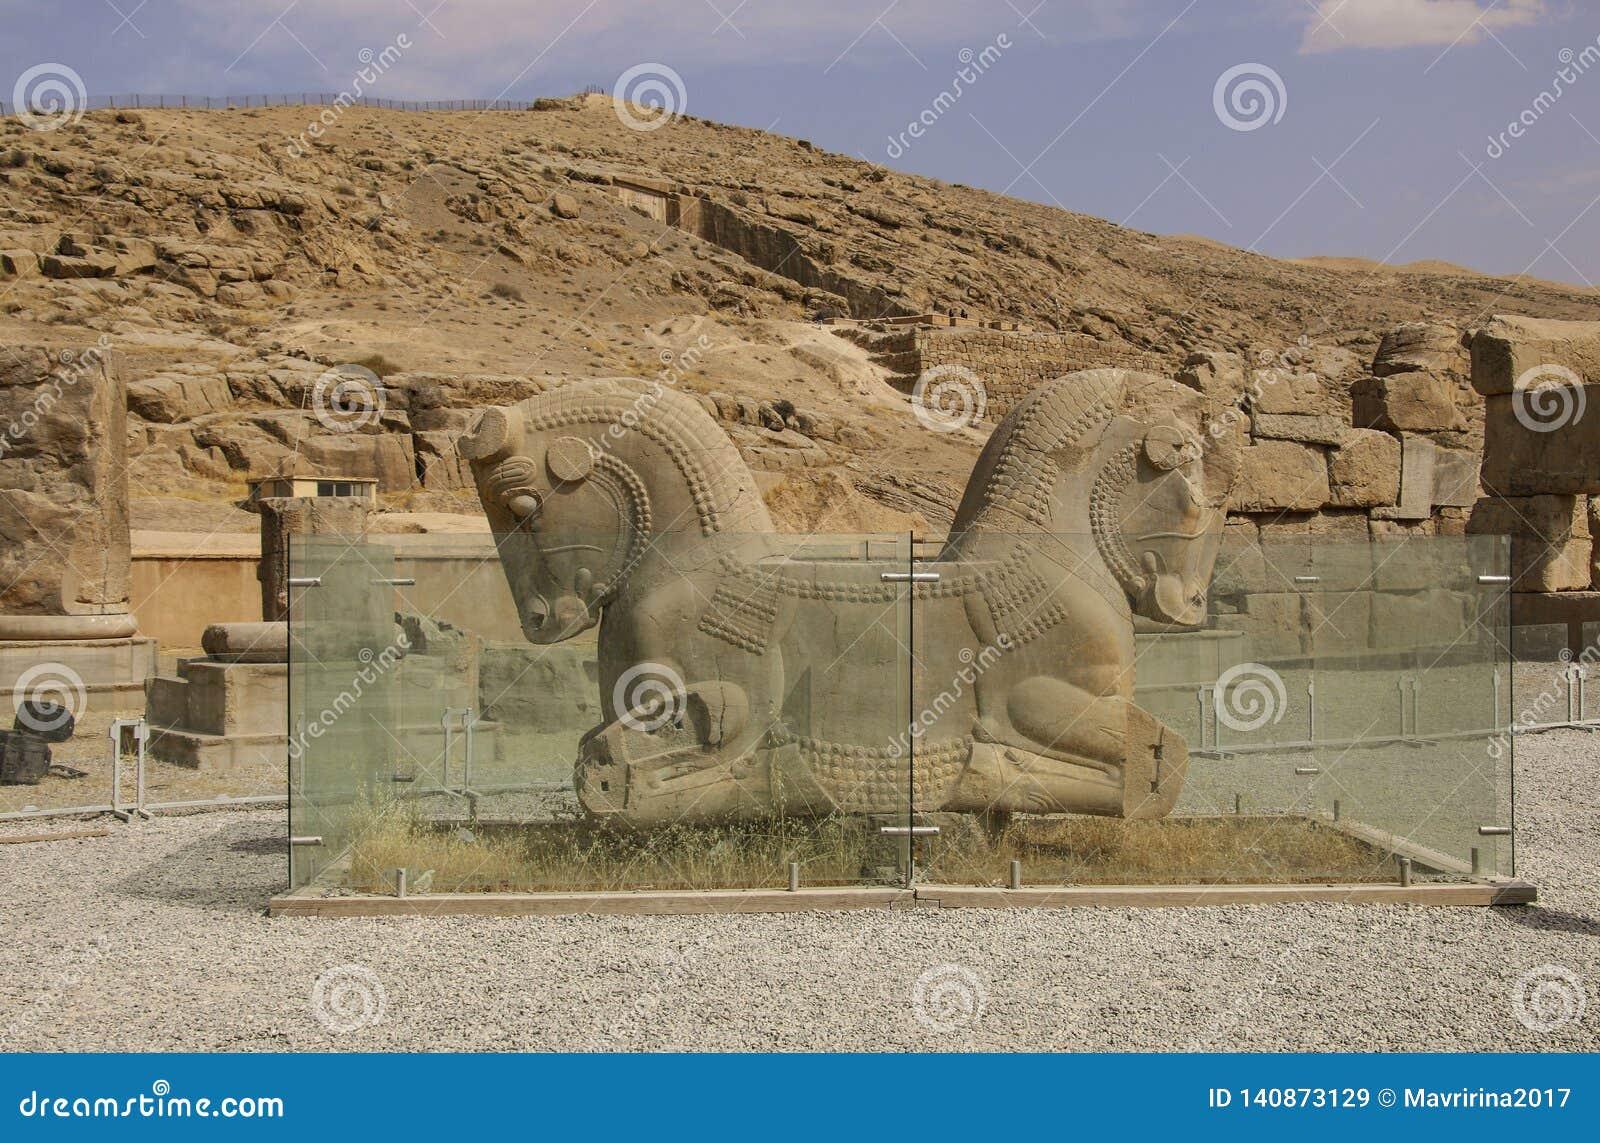 As ruínas antigas do complexo de Persepolis, capital cerimonial famoso da Pérsia antiga, Irã